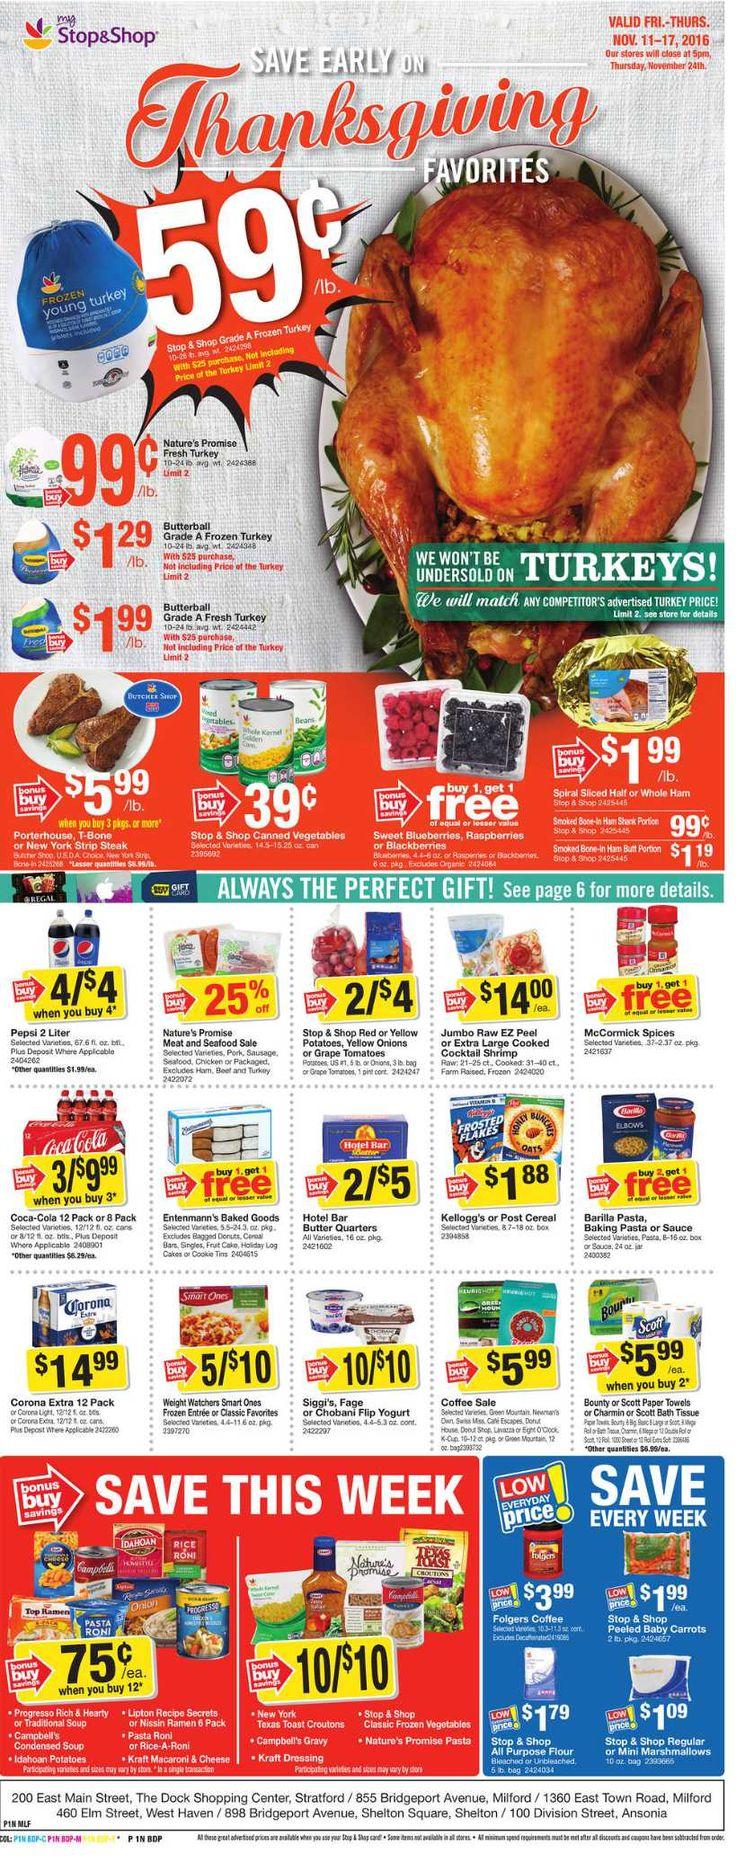 Stop and Shop Circular November 11 - 17, 2016 - http://www.olcatalog.com/grocery/stop-and-shop-circular.html